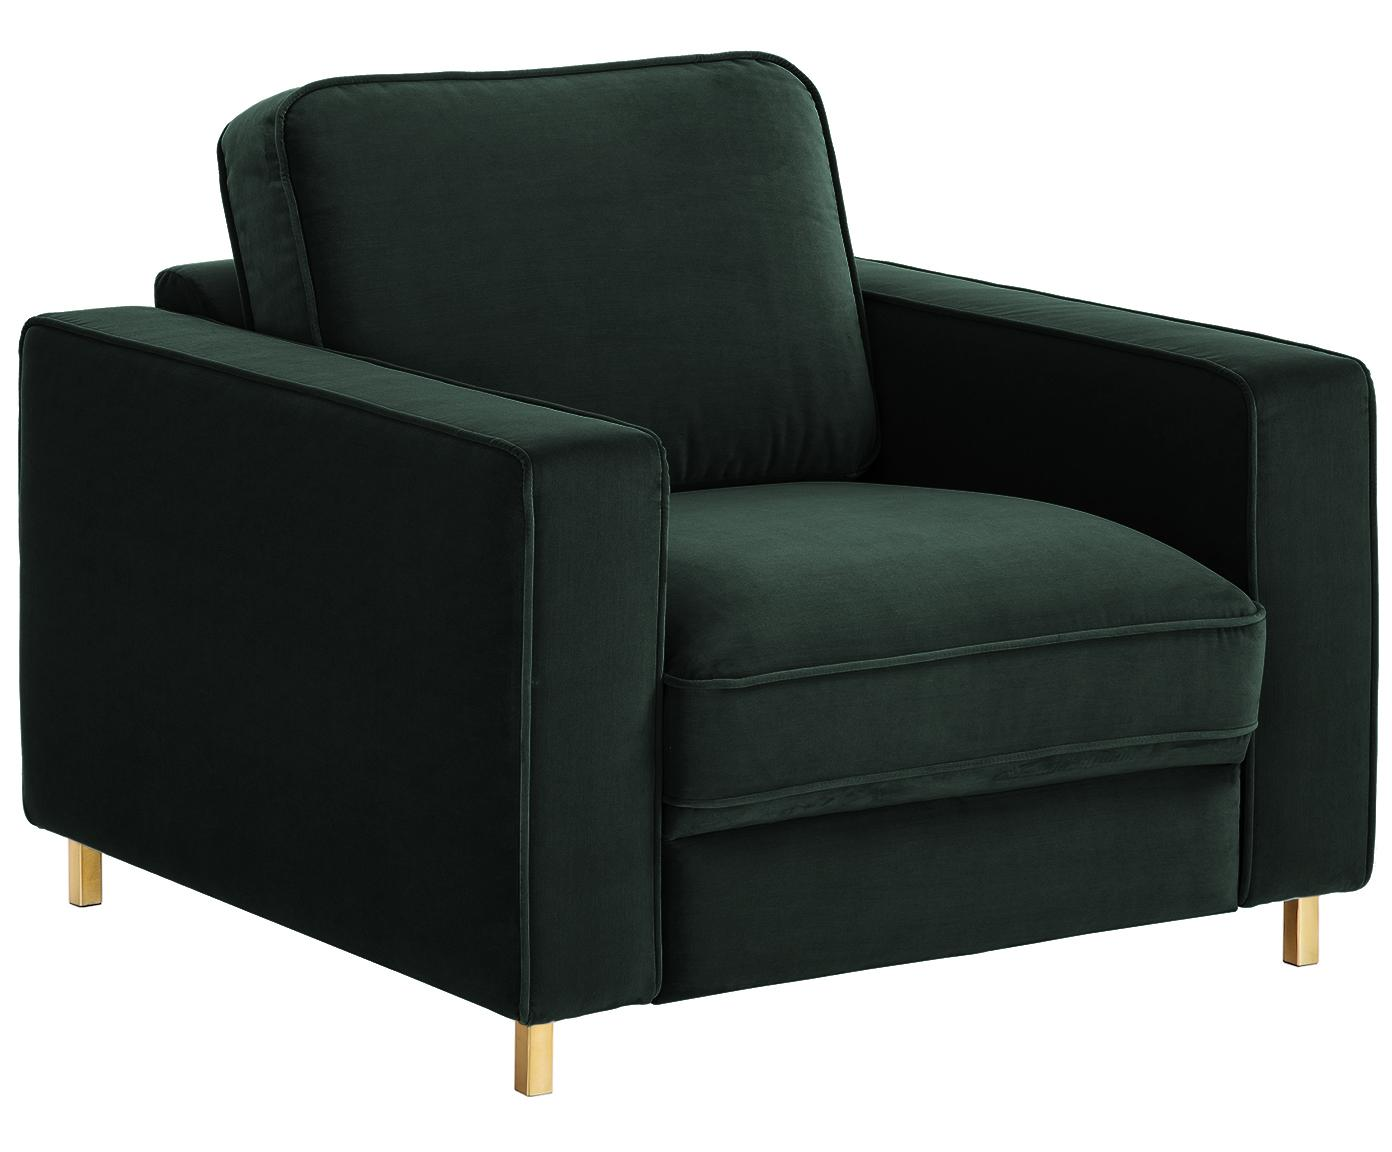 Samt-Sessel Chelsea, Bezug: Samt (Hochwertiger Polyes, Gestell: Massives Fichtenholz, Samt Dunkelgrün, B 83 x T 93 cm